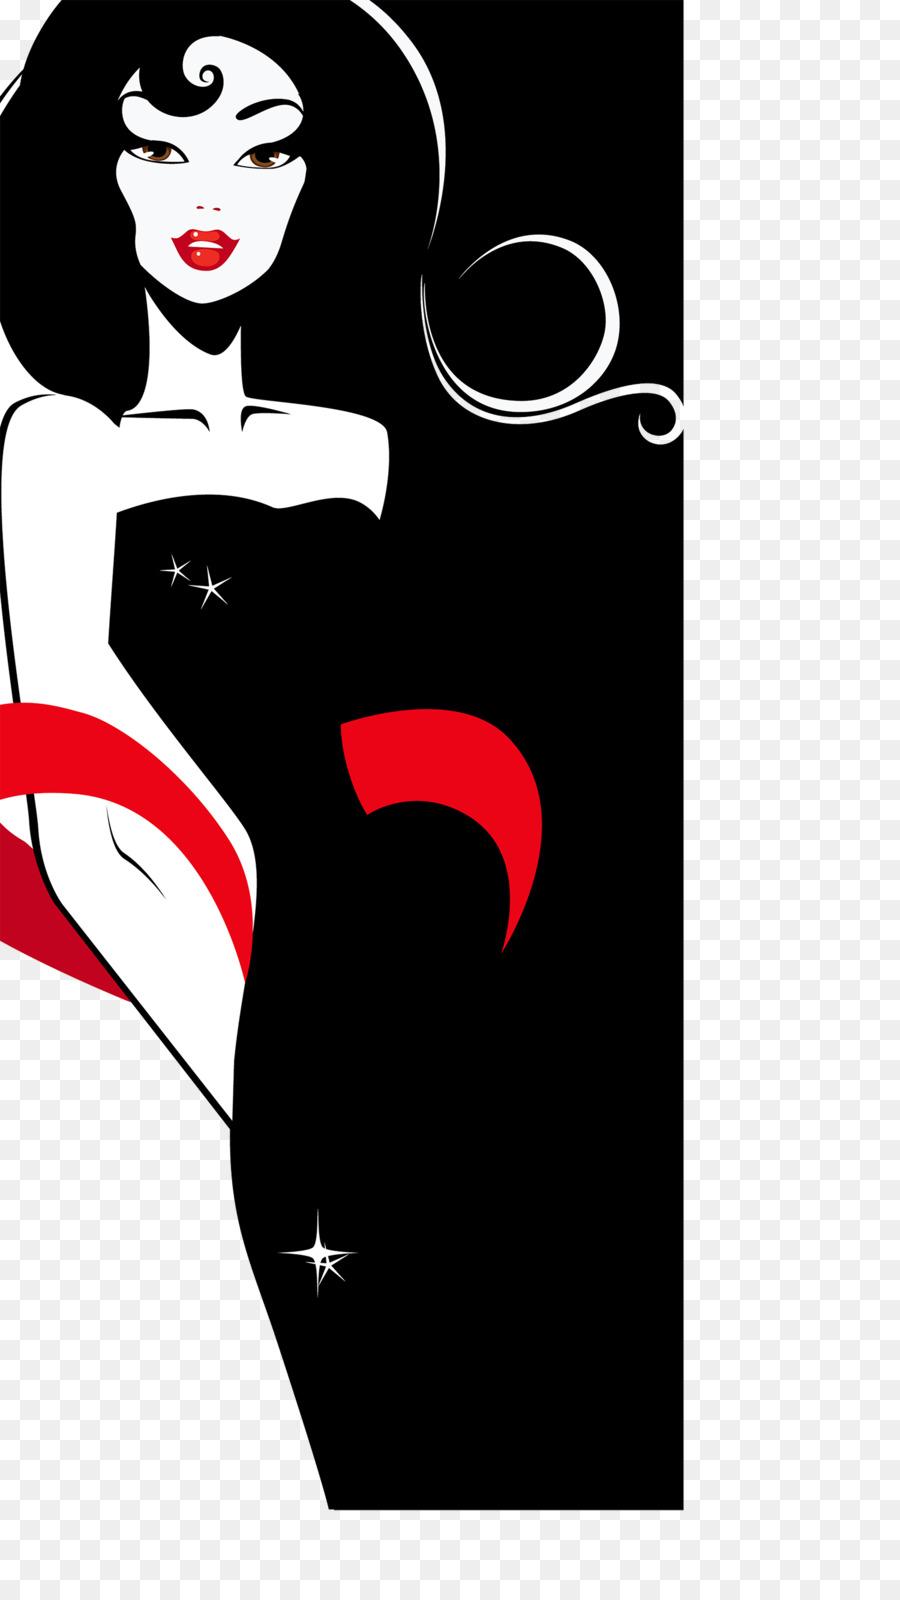 900x1600 Woman Silhouette Elegance Clip Art